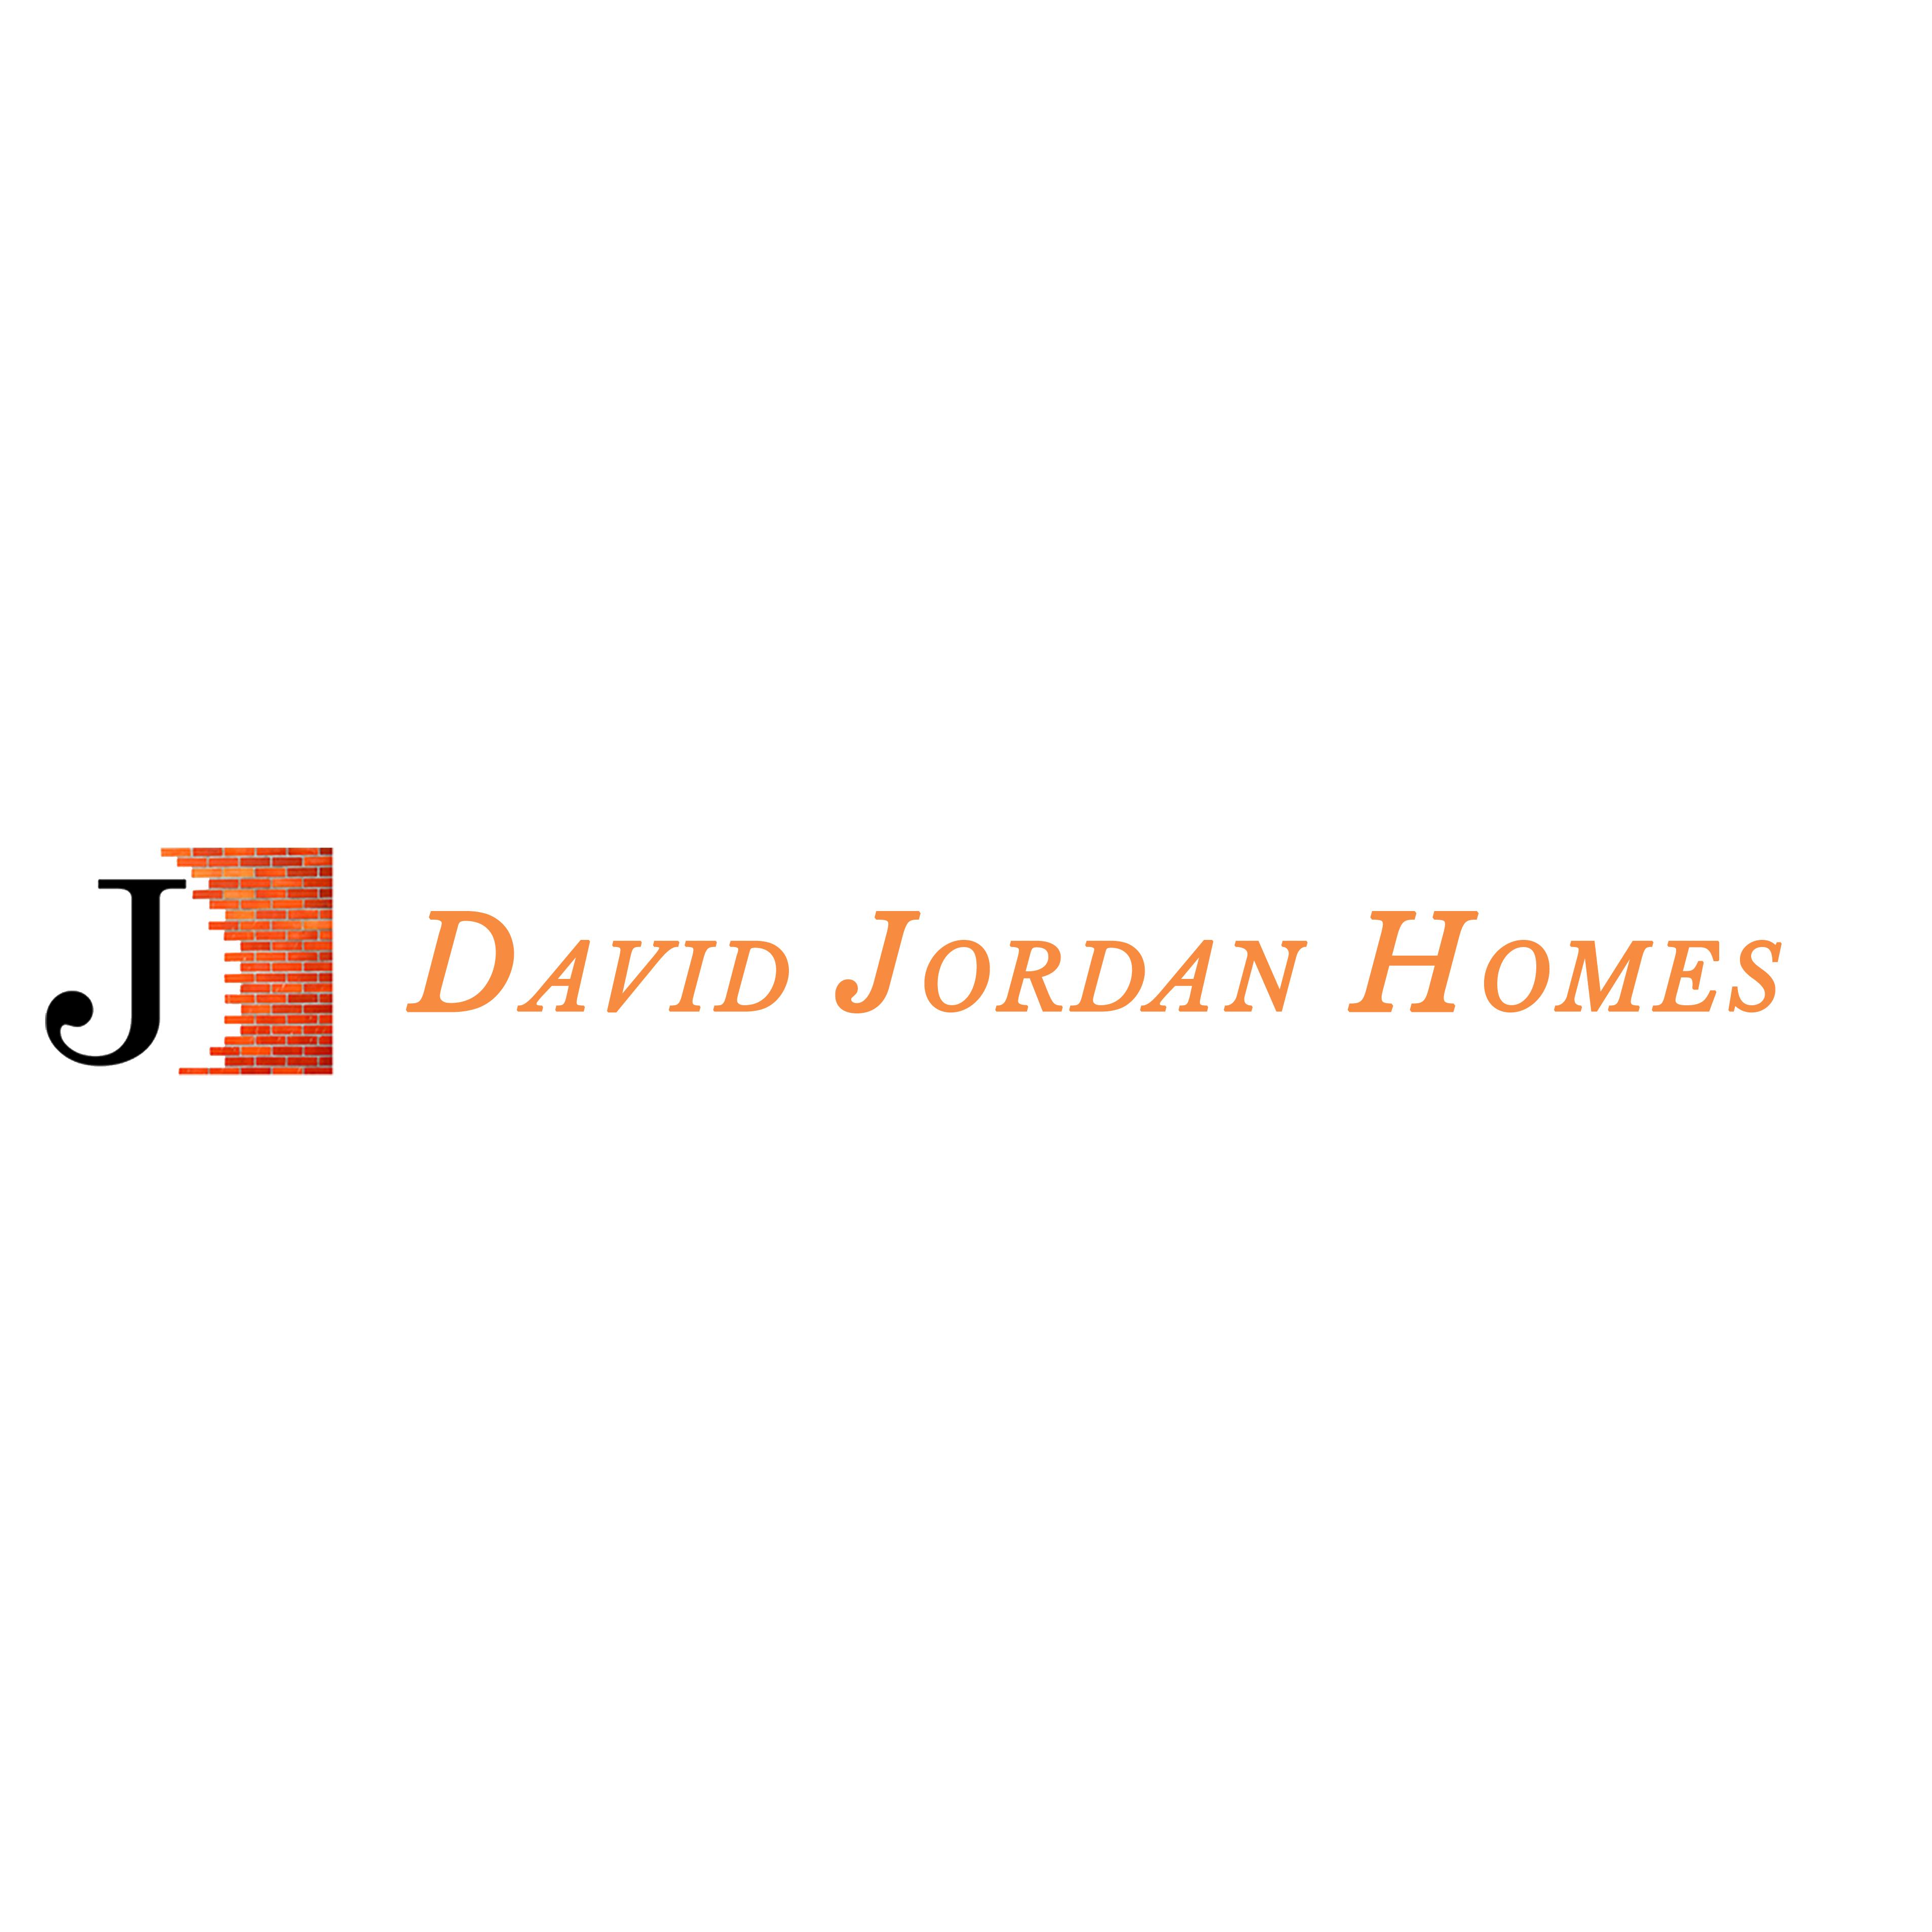 David Jordan Custom Homes - Lubbock, TX - Landscape Architects & Design